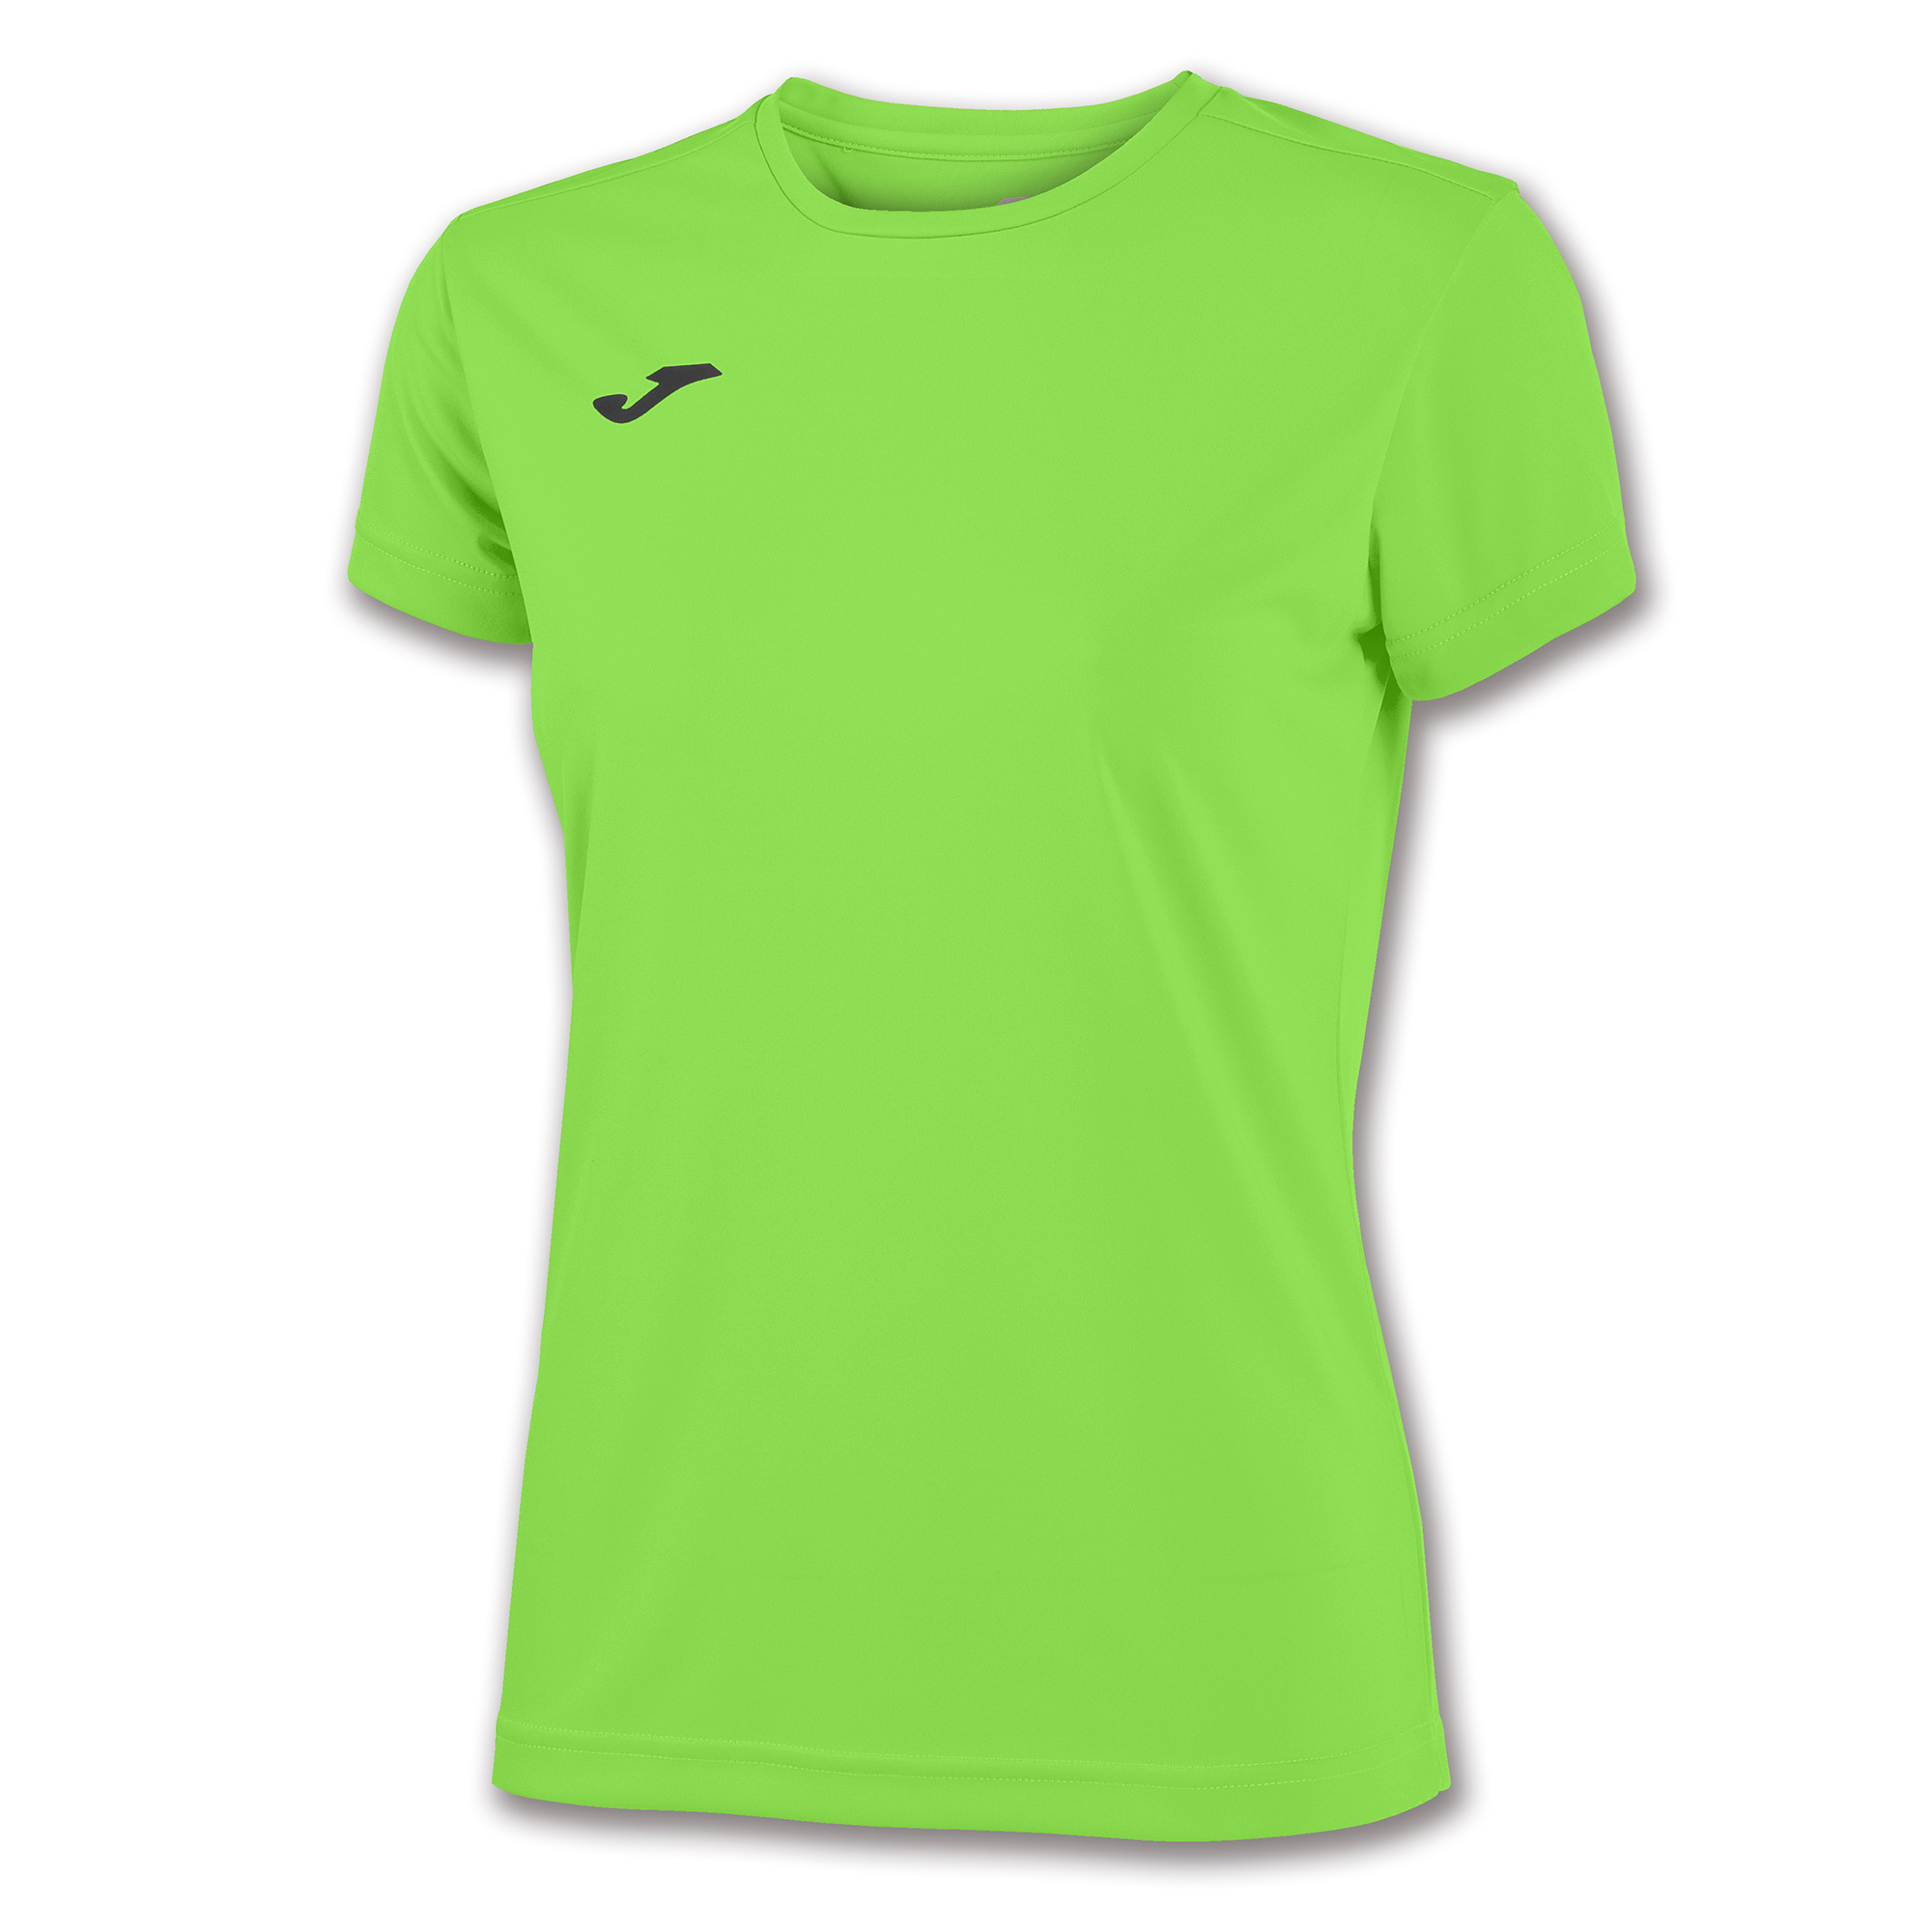 Joma 900248 600 T-Shirt Femme